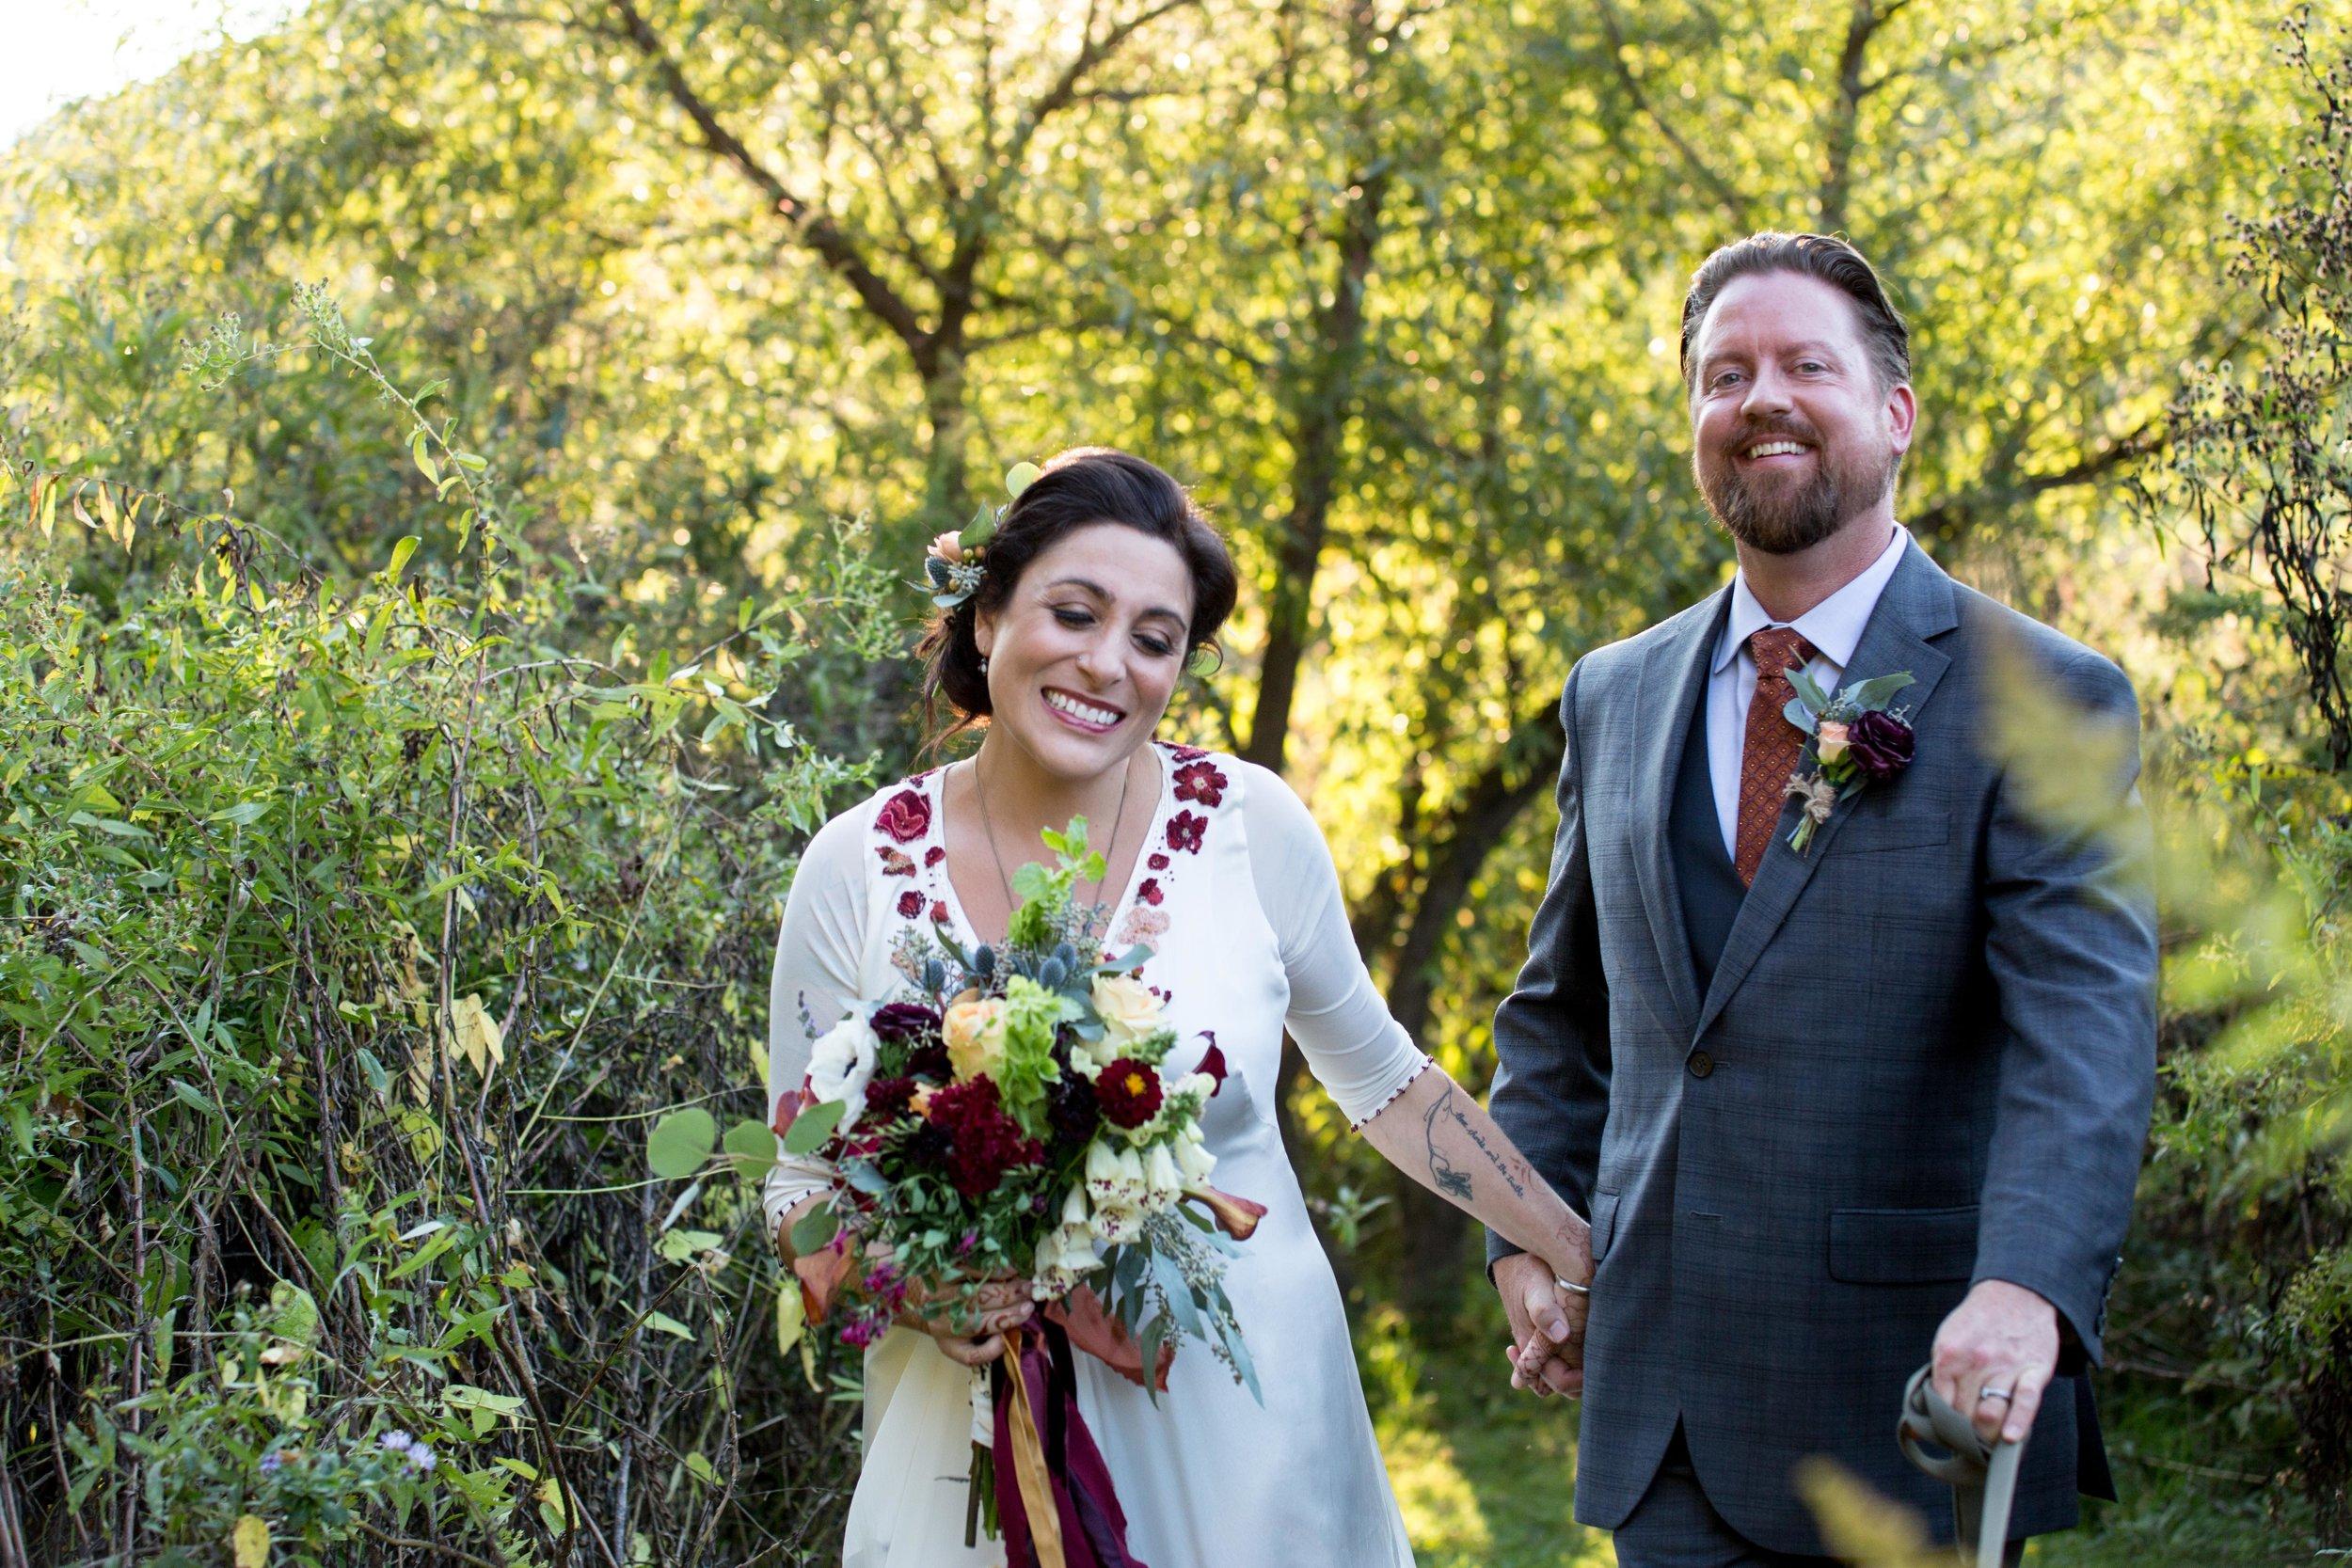 Jane Kramer + Jason Sandford Ashevegas wedding best photographer WNC -63.jpg